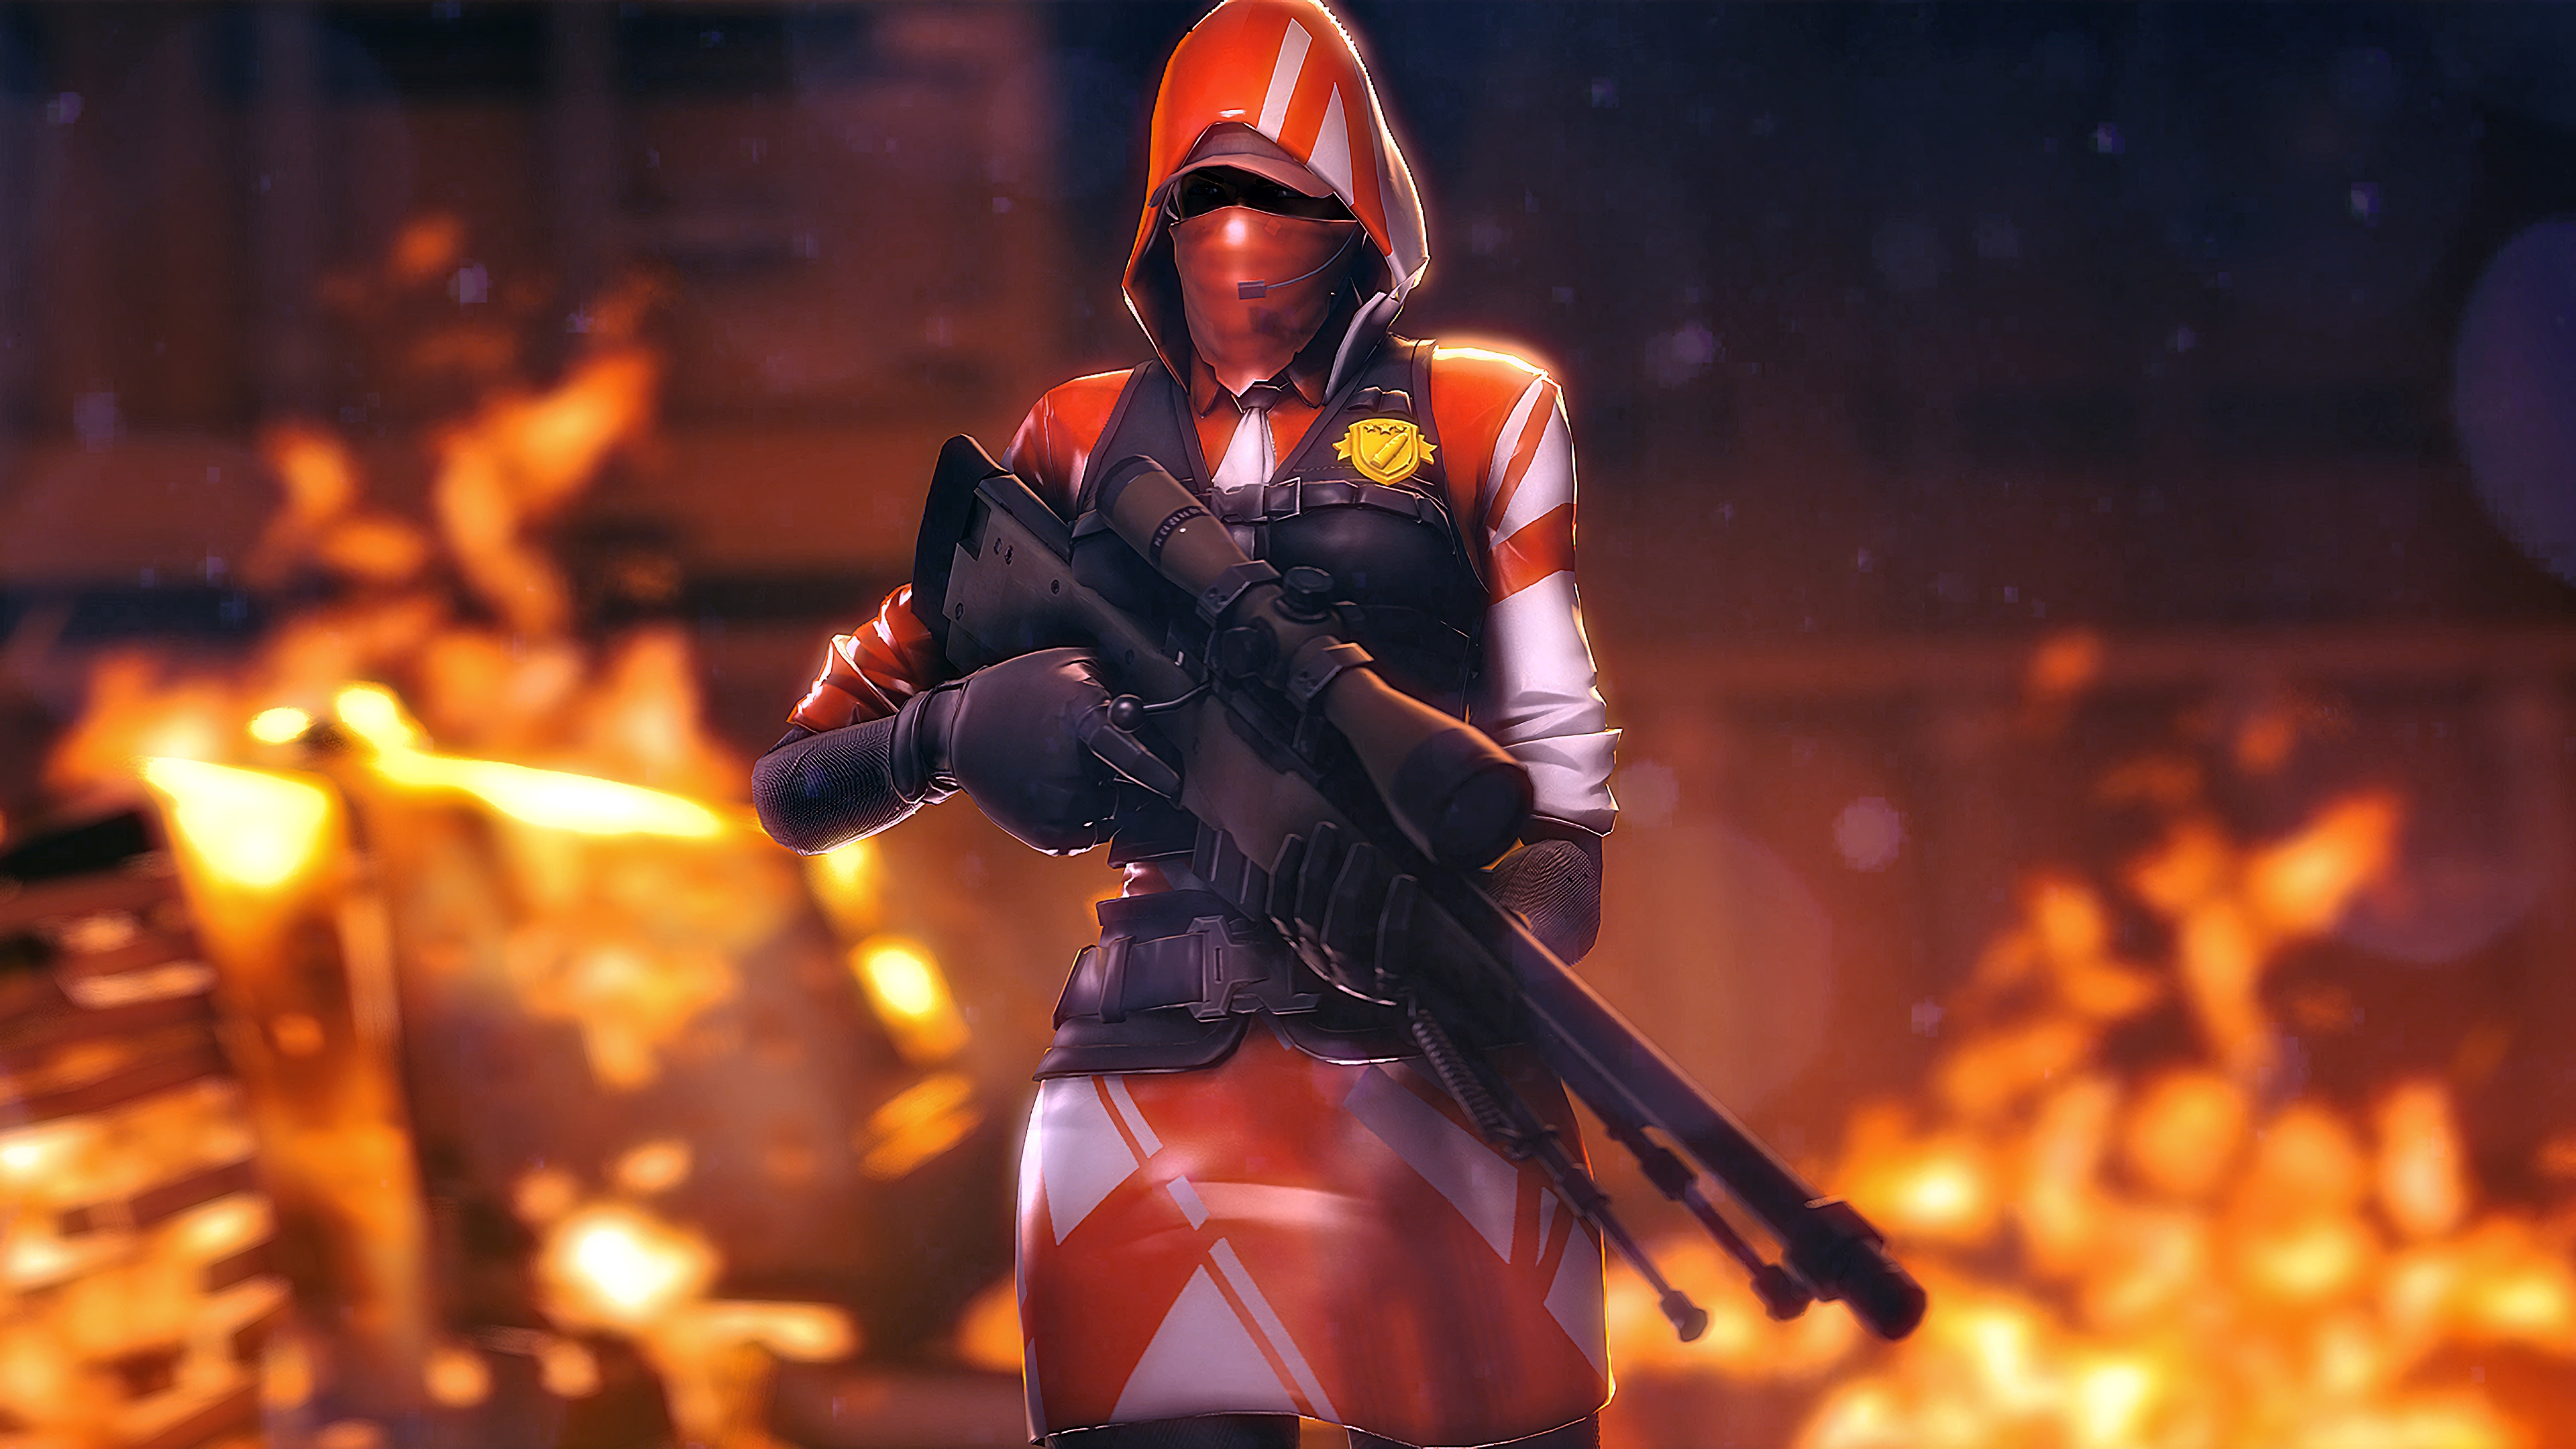 Wallpaper 4k Ace Sniper Rifle Fortnite Battle Royale 2018 games 3840x2160